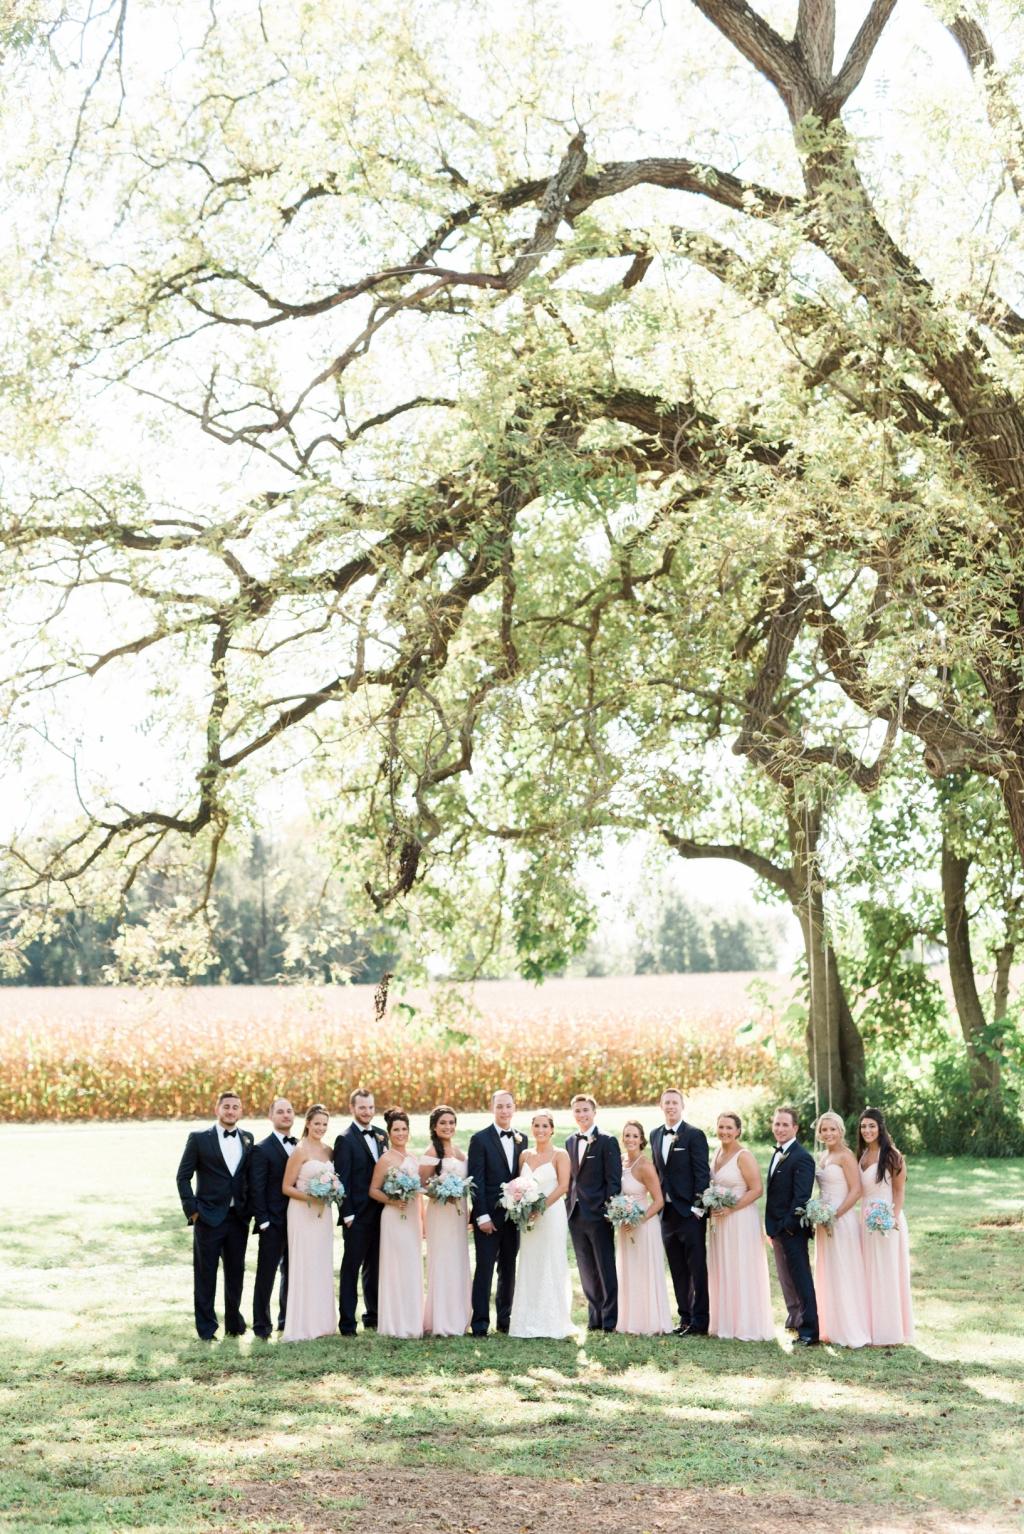 haley-richter-photography-buena-vista-confrence-center-wedding-summer-056